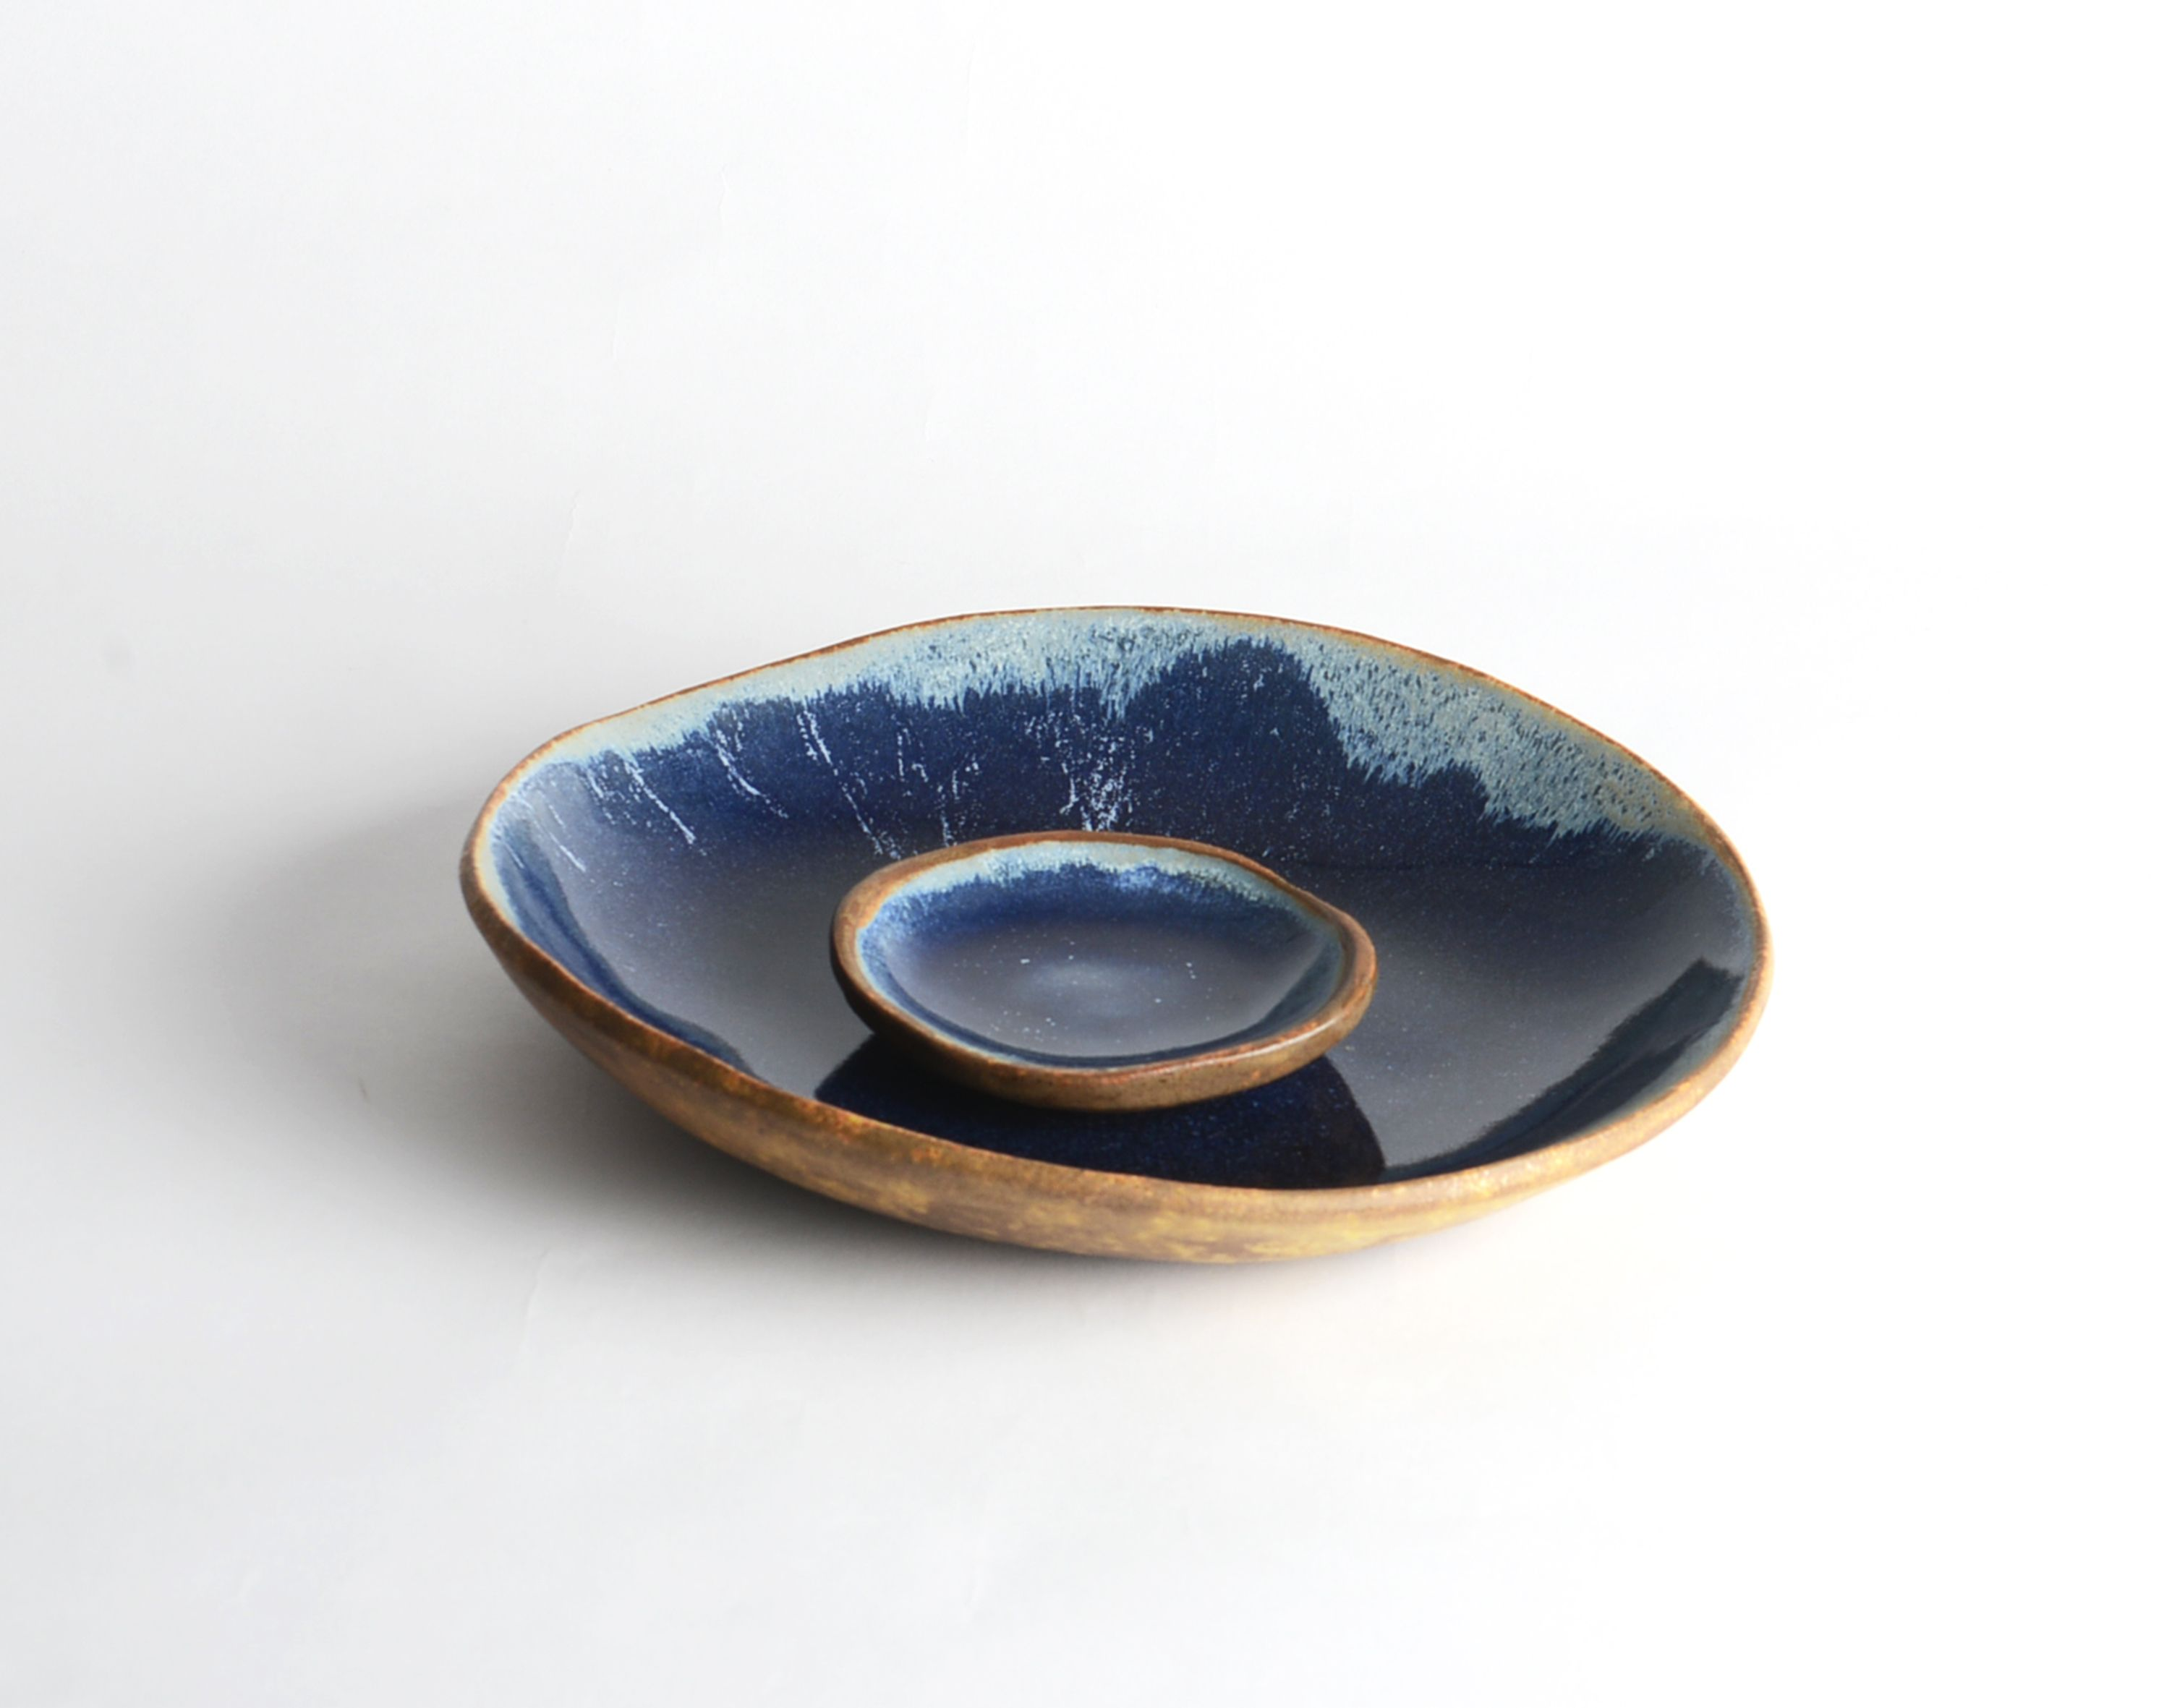 Cerâmica da Cris | Prato Pedra Azul #designbrasileiro #designbrasil #mobiliariobrasileiro #decoração #arquitetura #casa #braziliandesign #furniture #homedecor #interiordesign #decor #archtherapy #architecture #boobam #minimaldesign #decora #ceramica #handmadeporcelain #porcelana #ceramicaartesanal